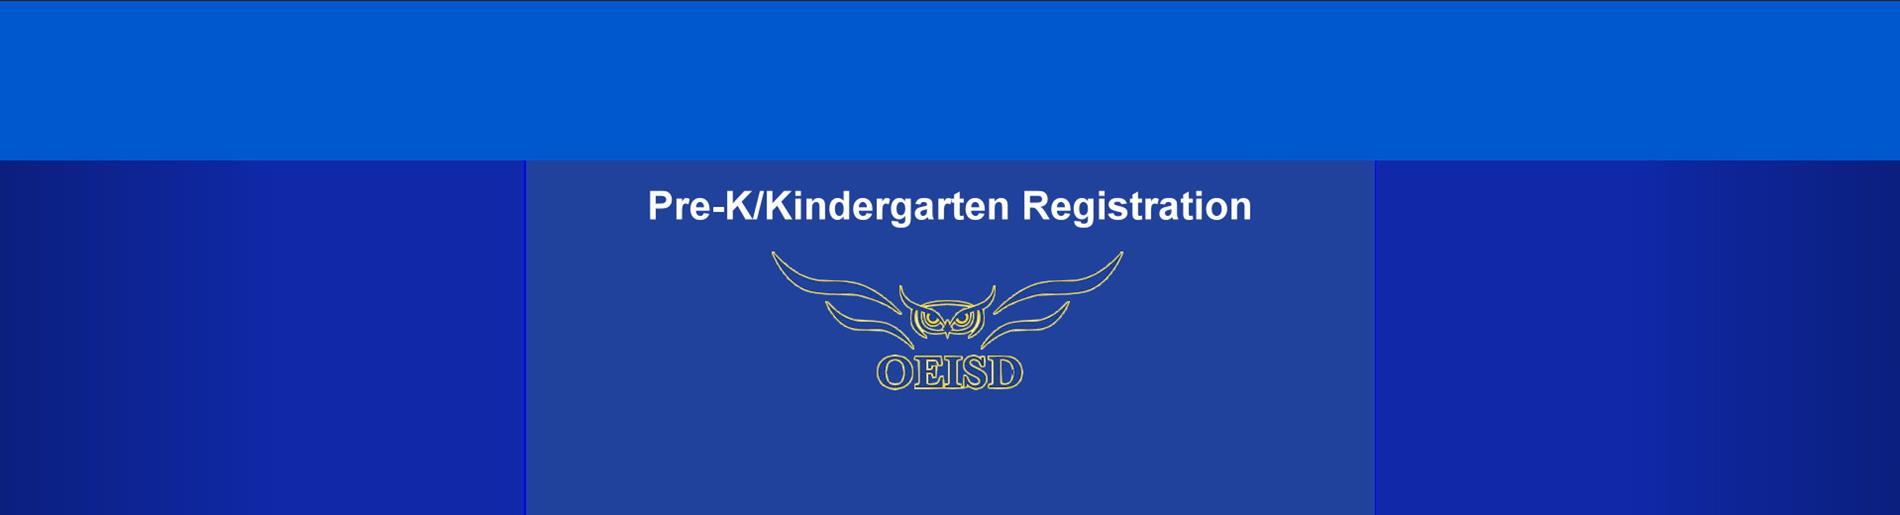 Pre-K/Kindergarten Registration Information